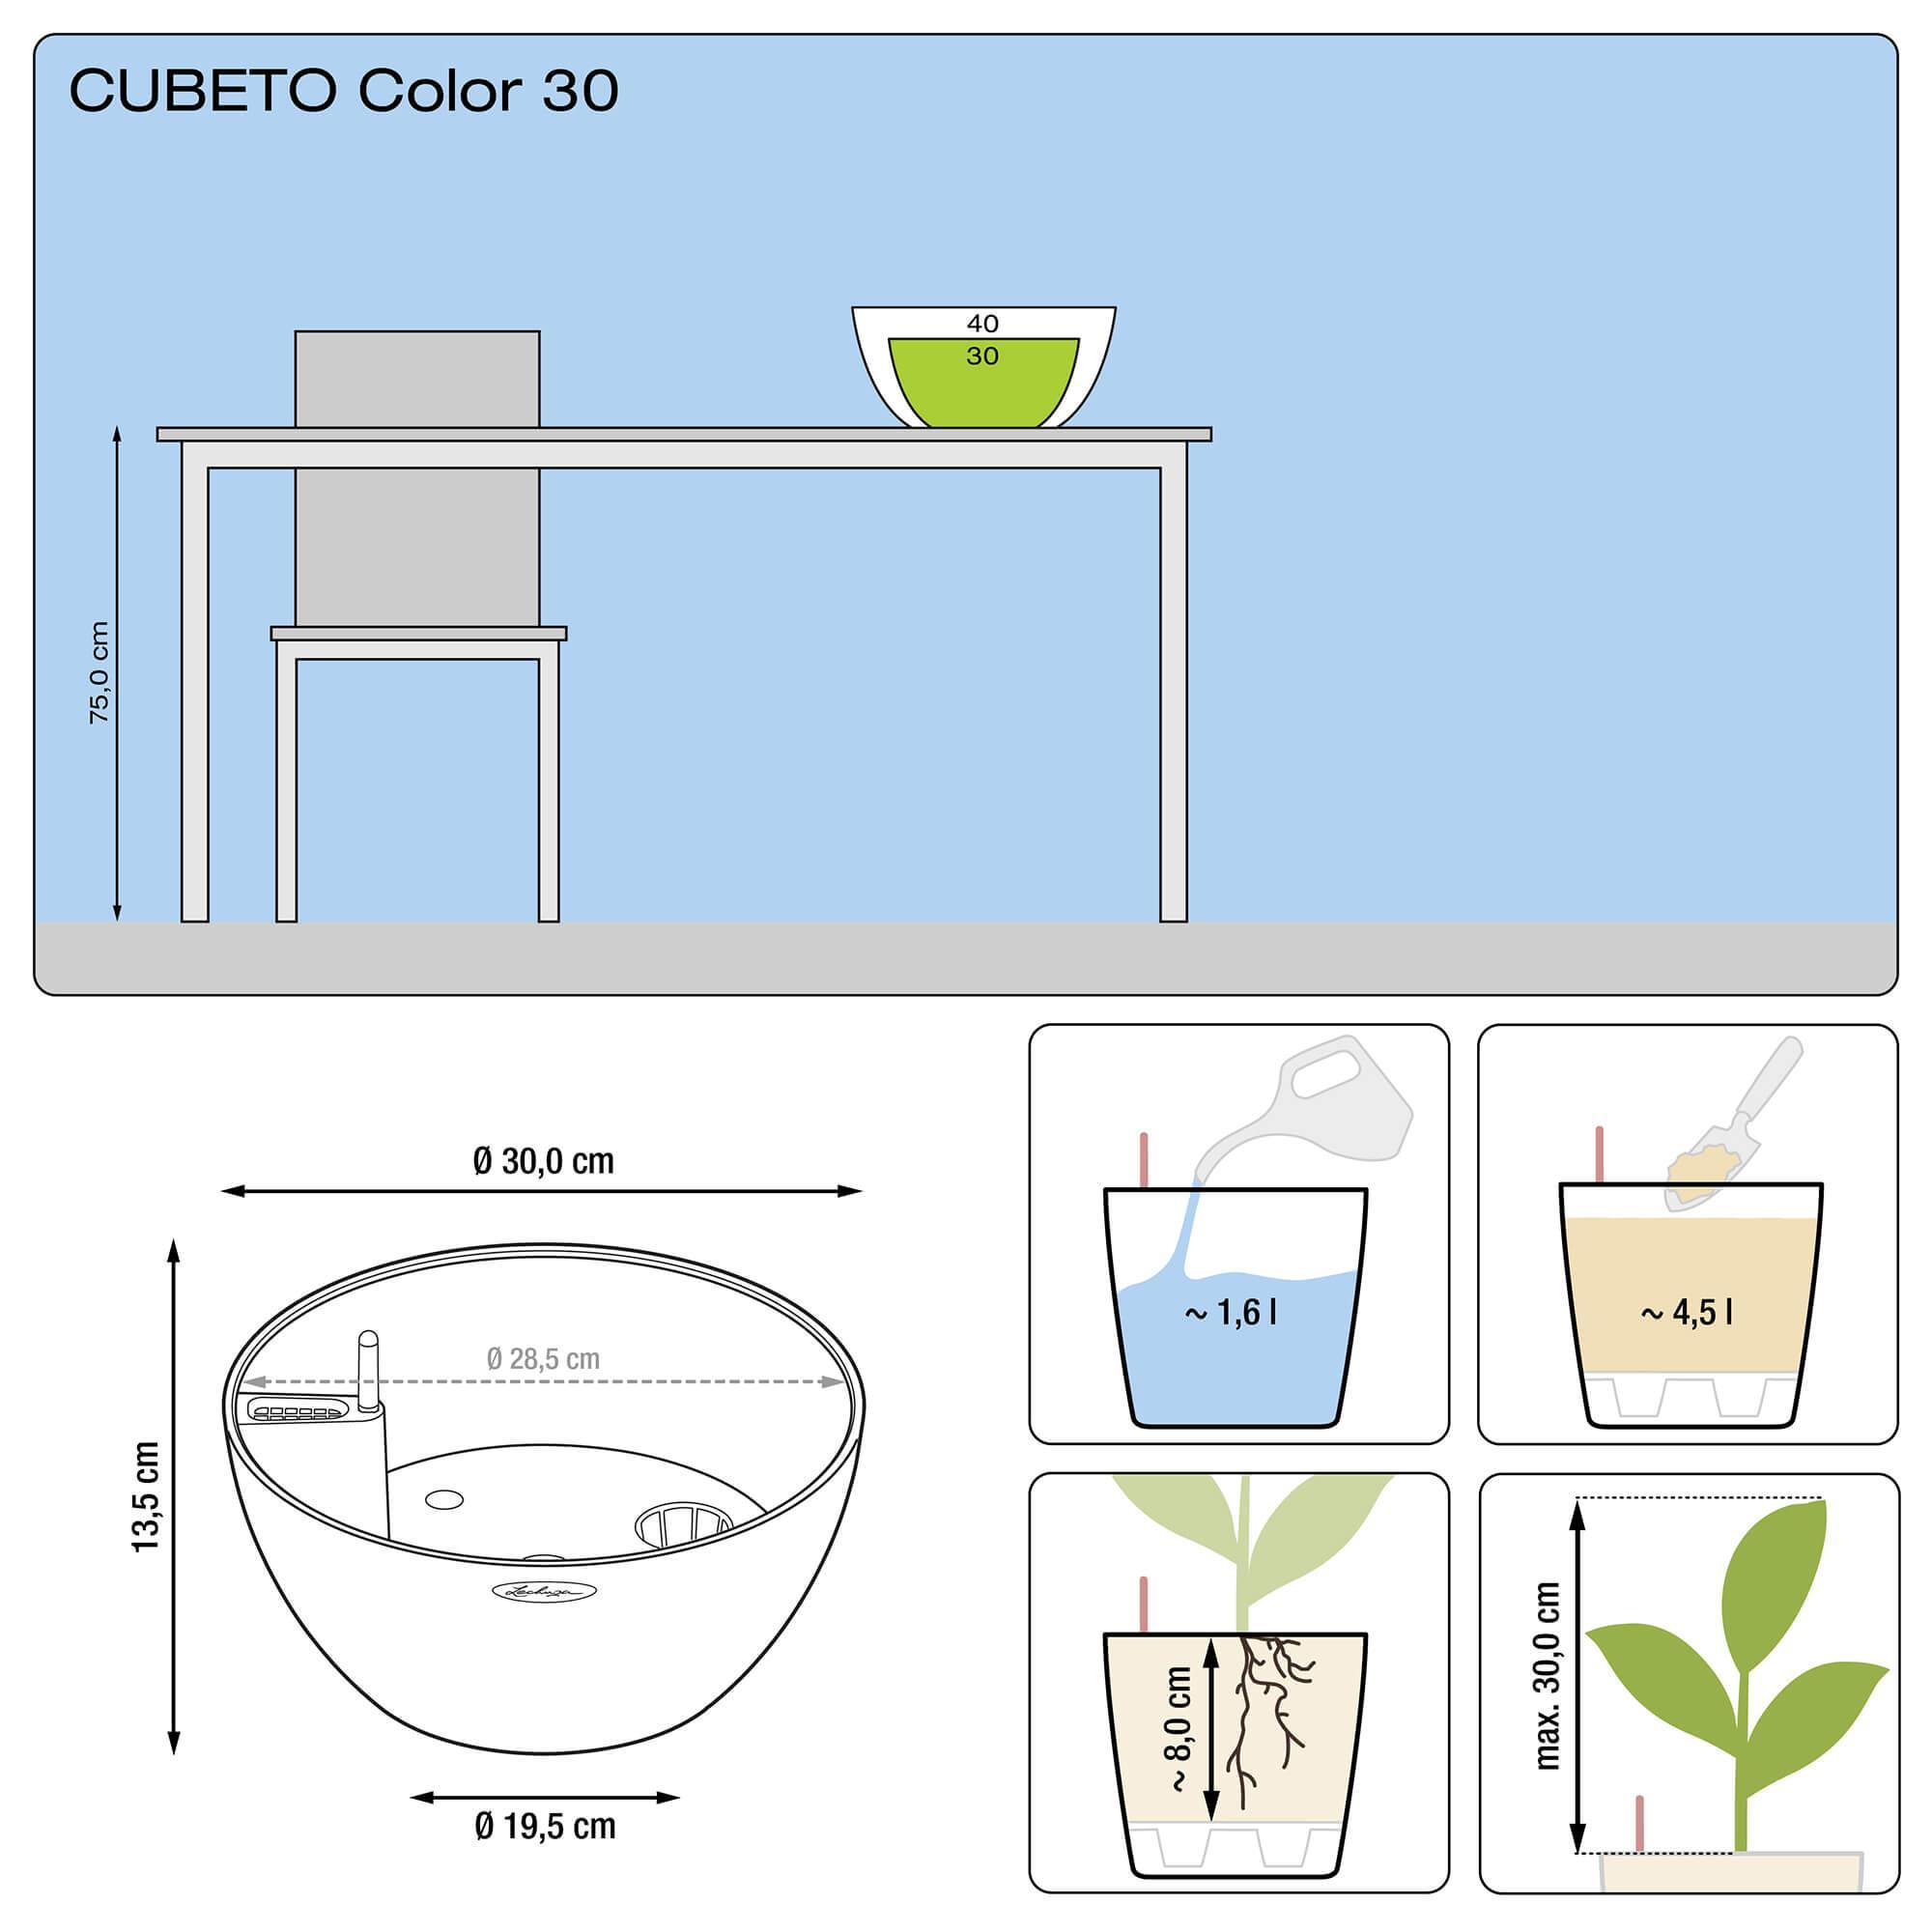 CUBETO Color 30 beige arena - Imagen 2